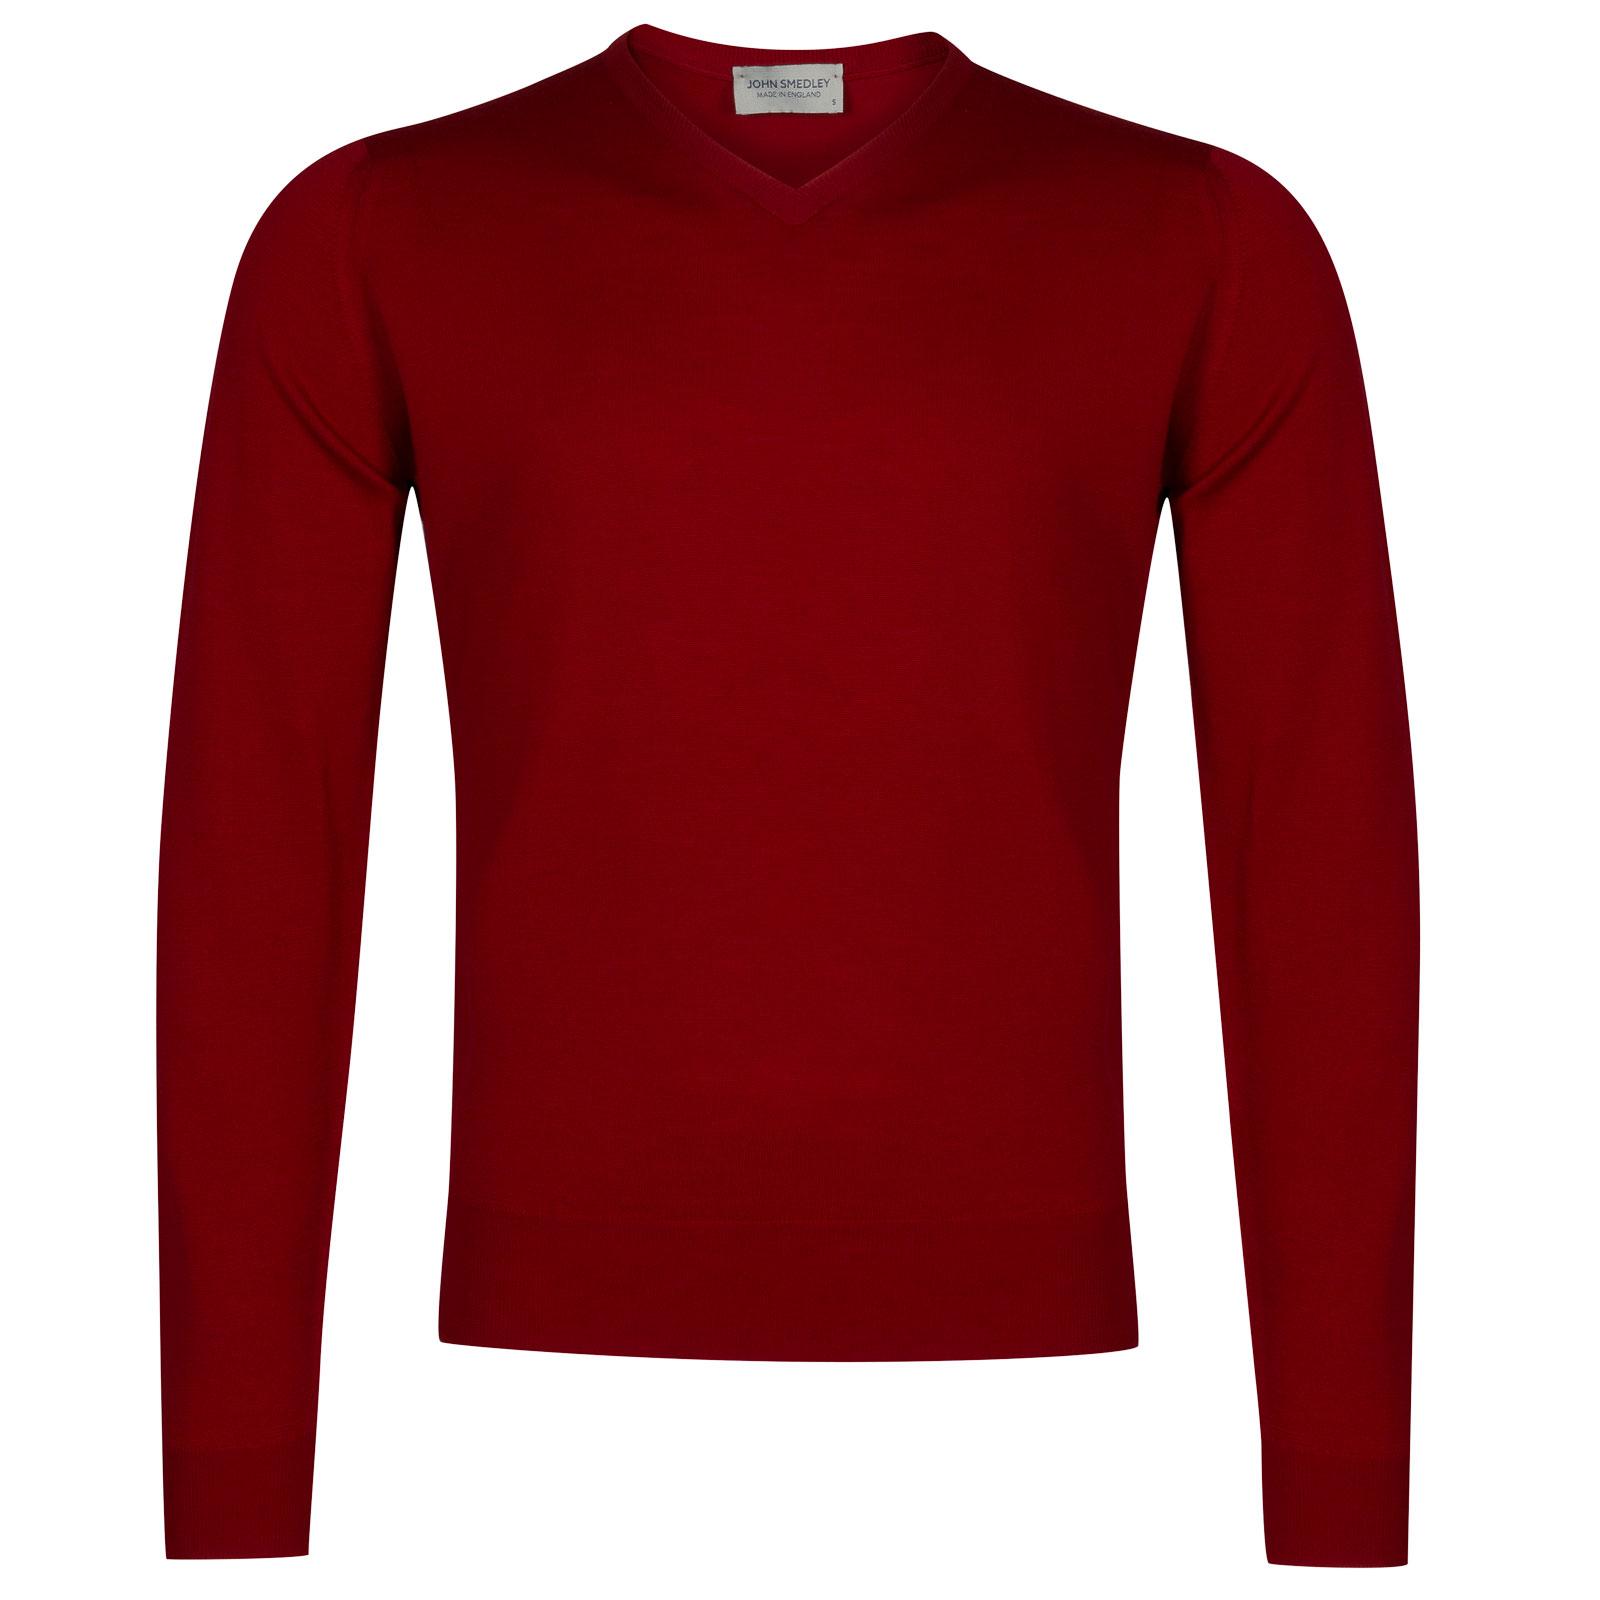 John Smedley genoa Merino Wool Pullover in Crimson Forest-XL